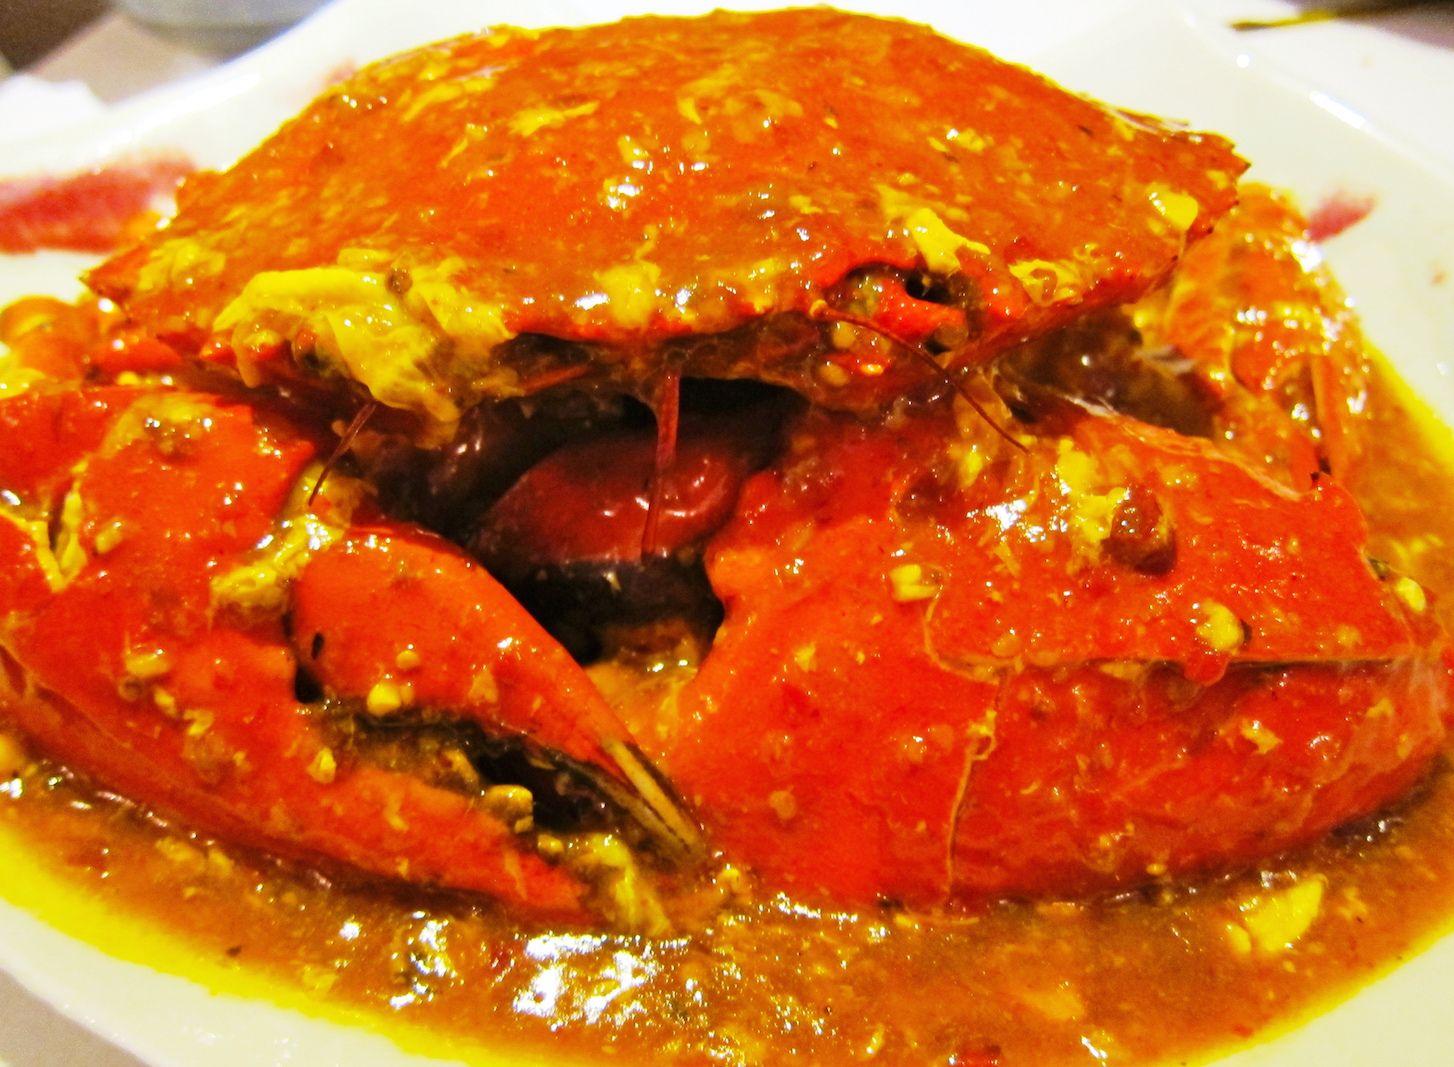 Recipe for The Hirshon Singapore Chili Crab!